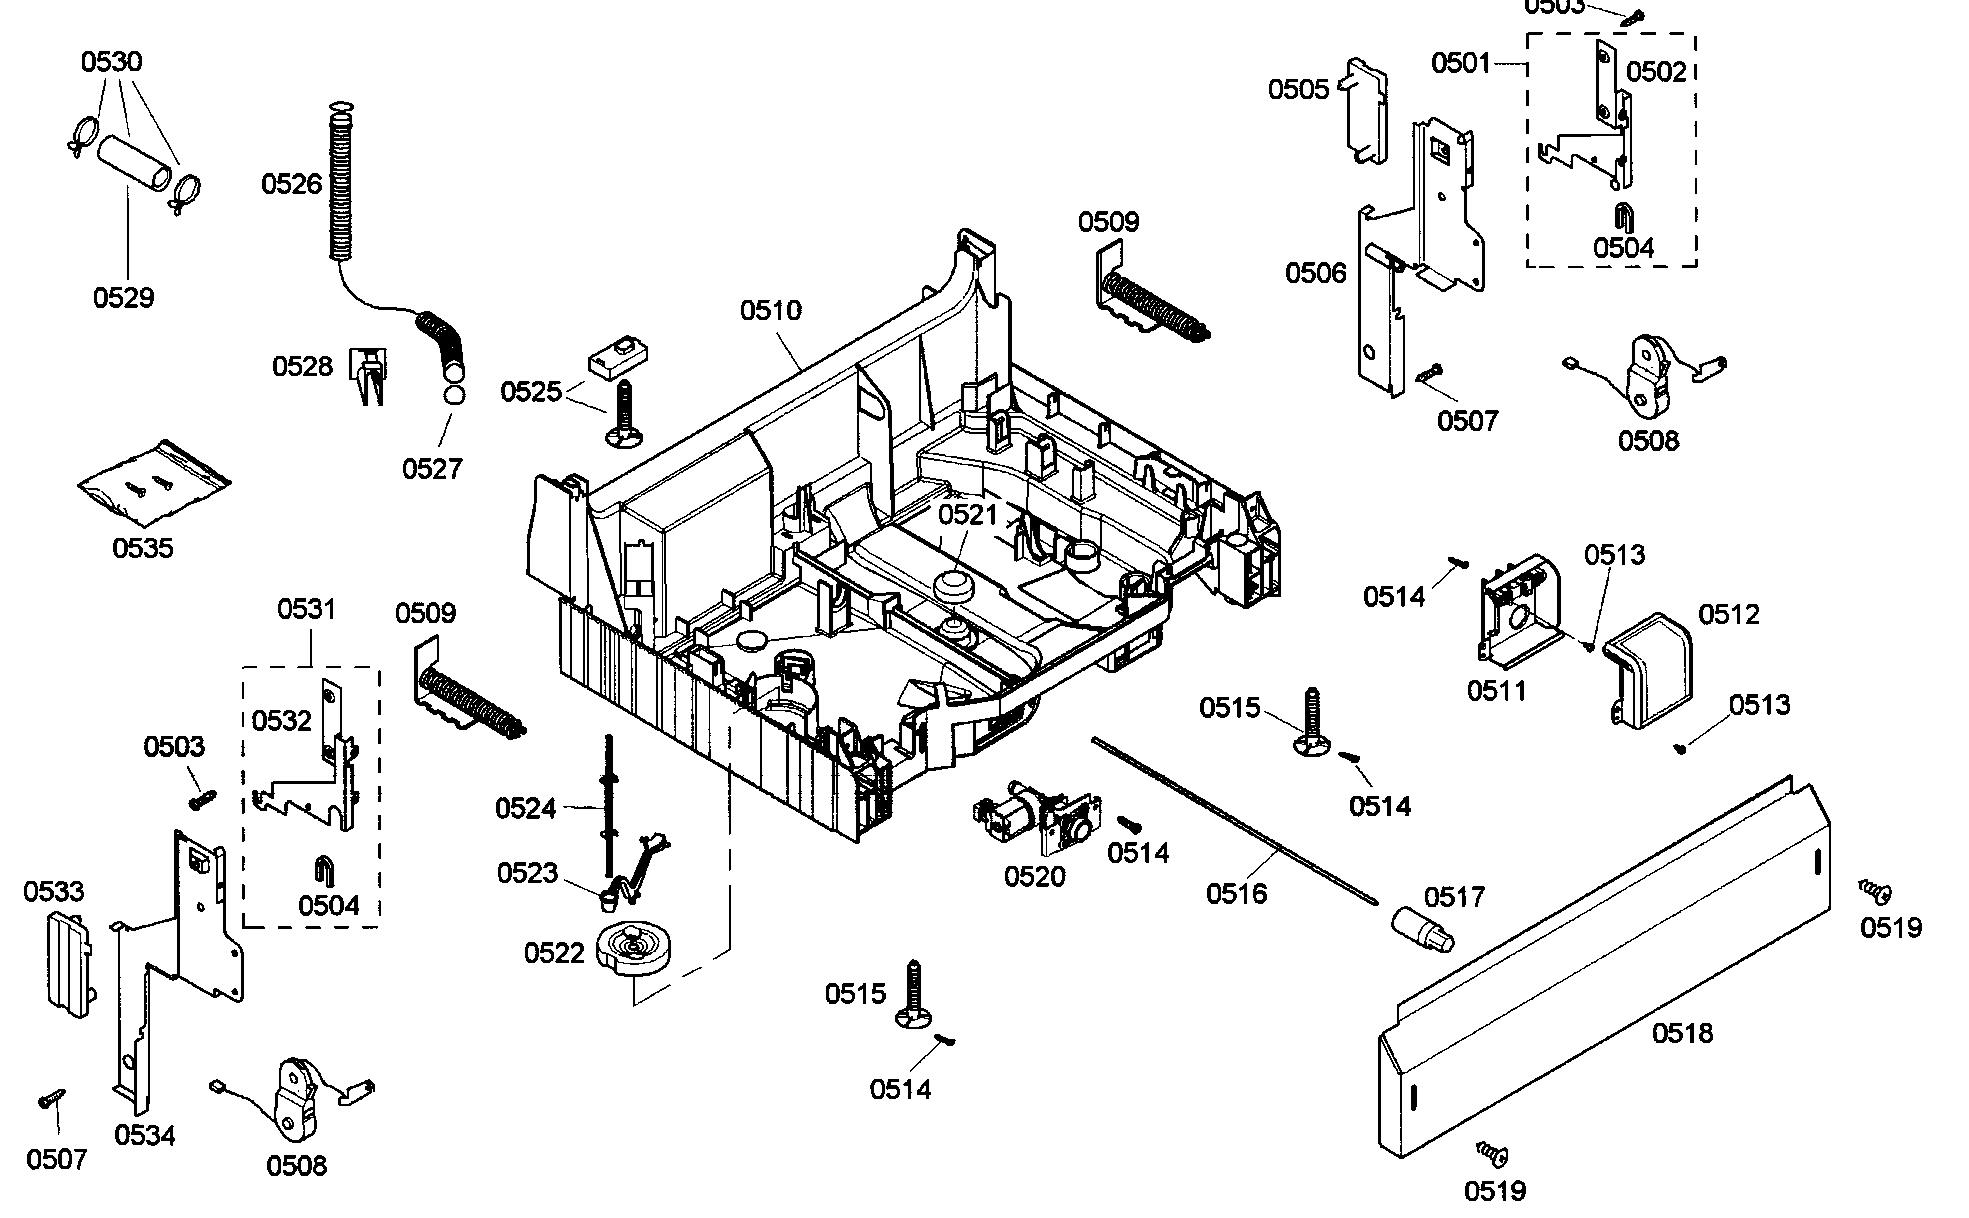 (33 parts)